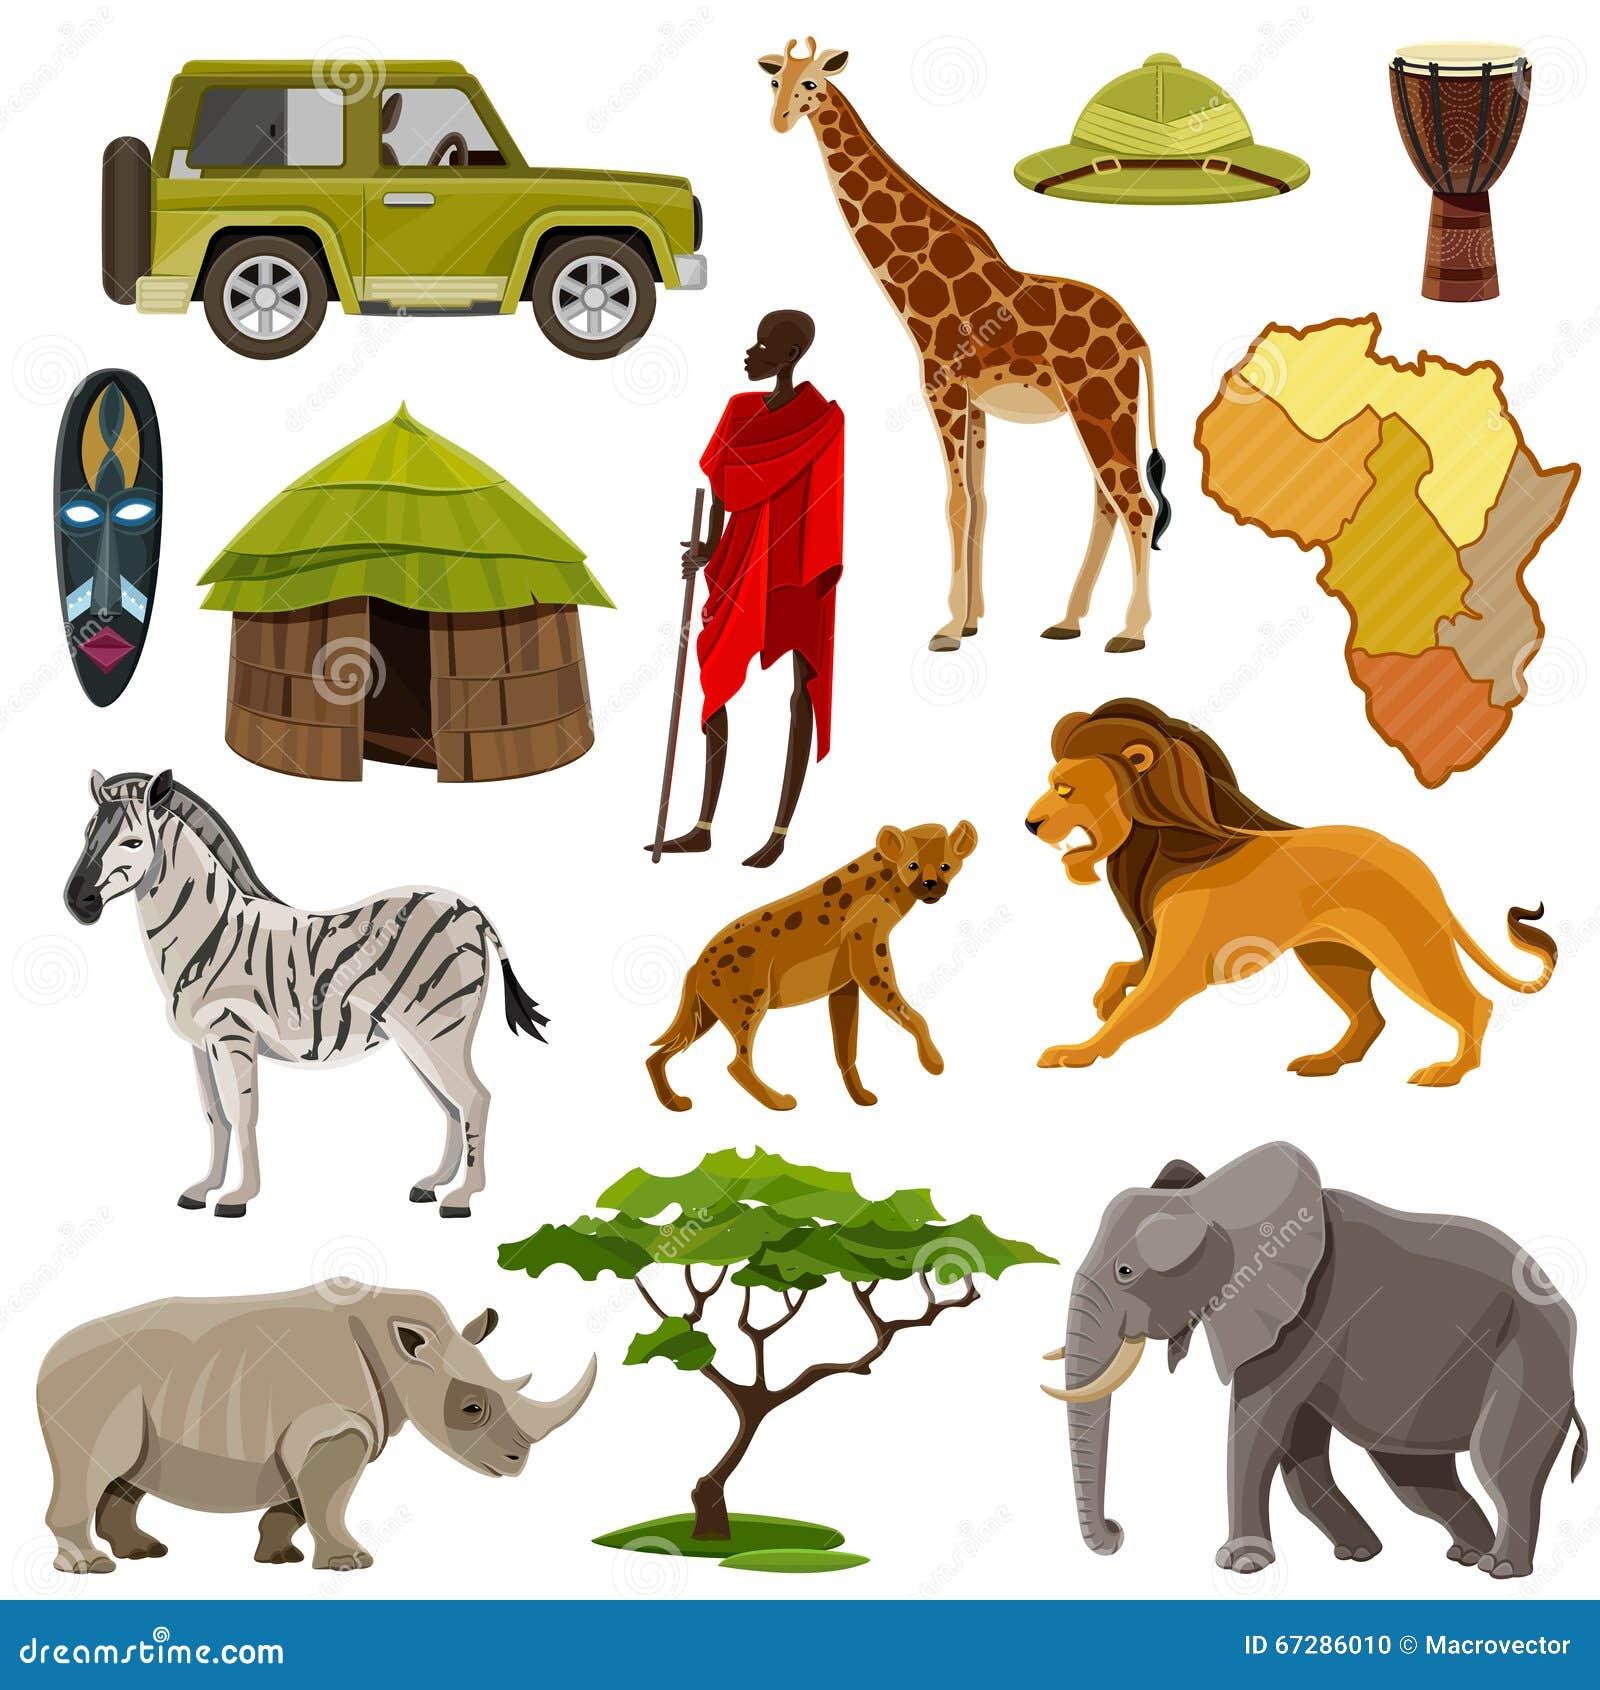 Afrika-Ikonen eingestellt